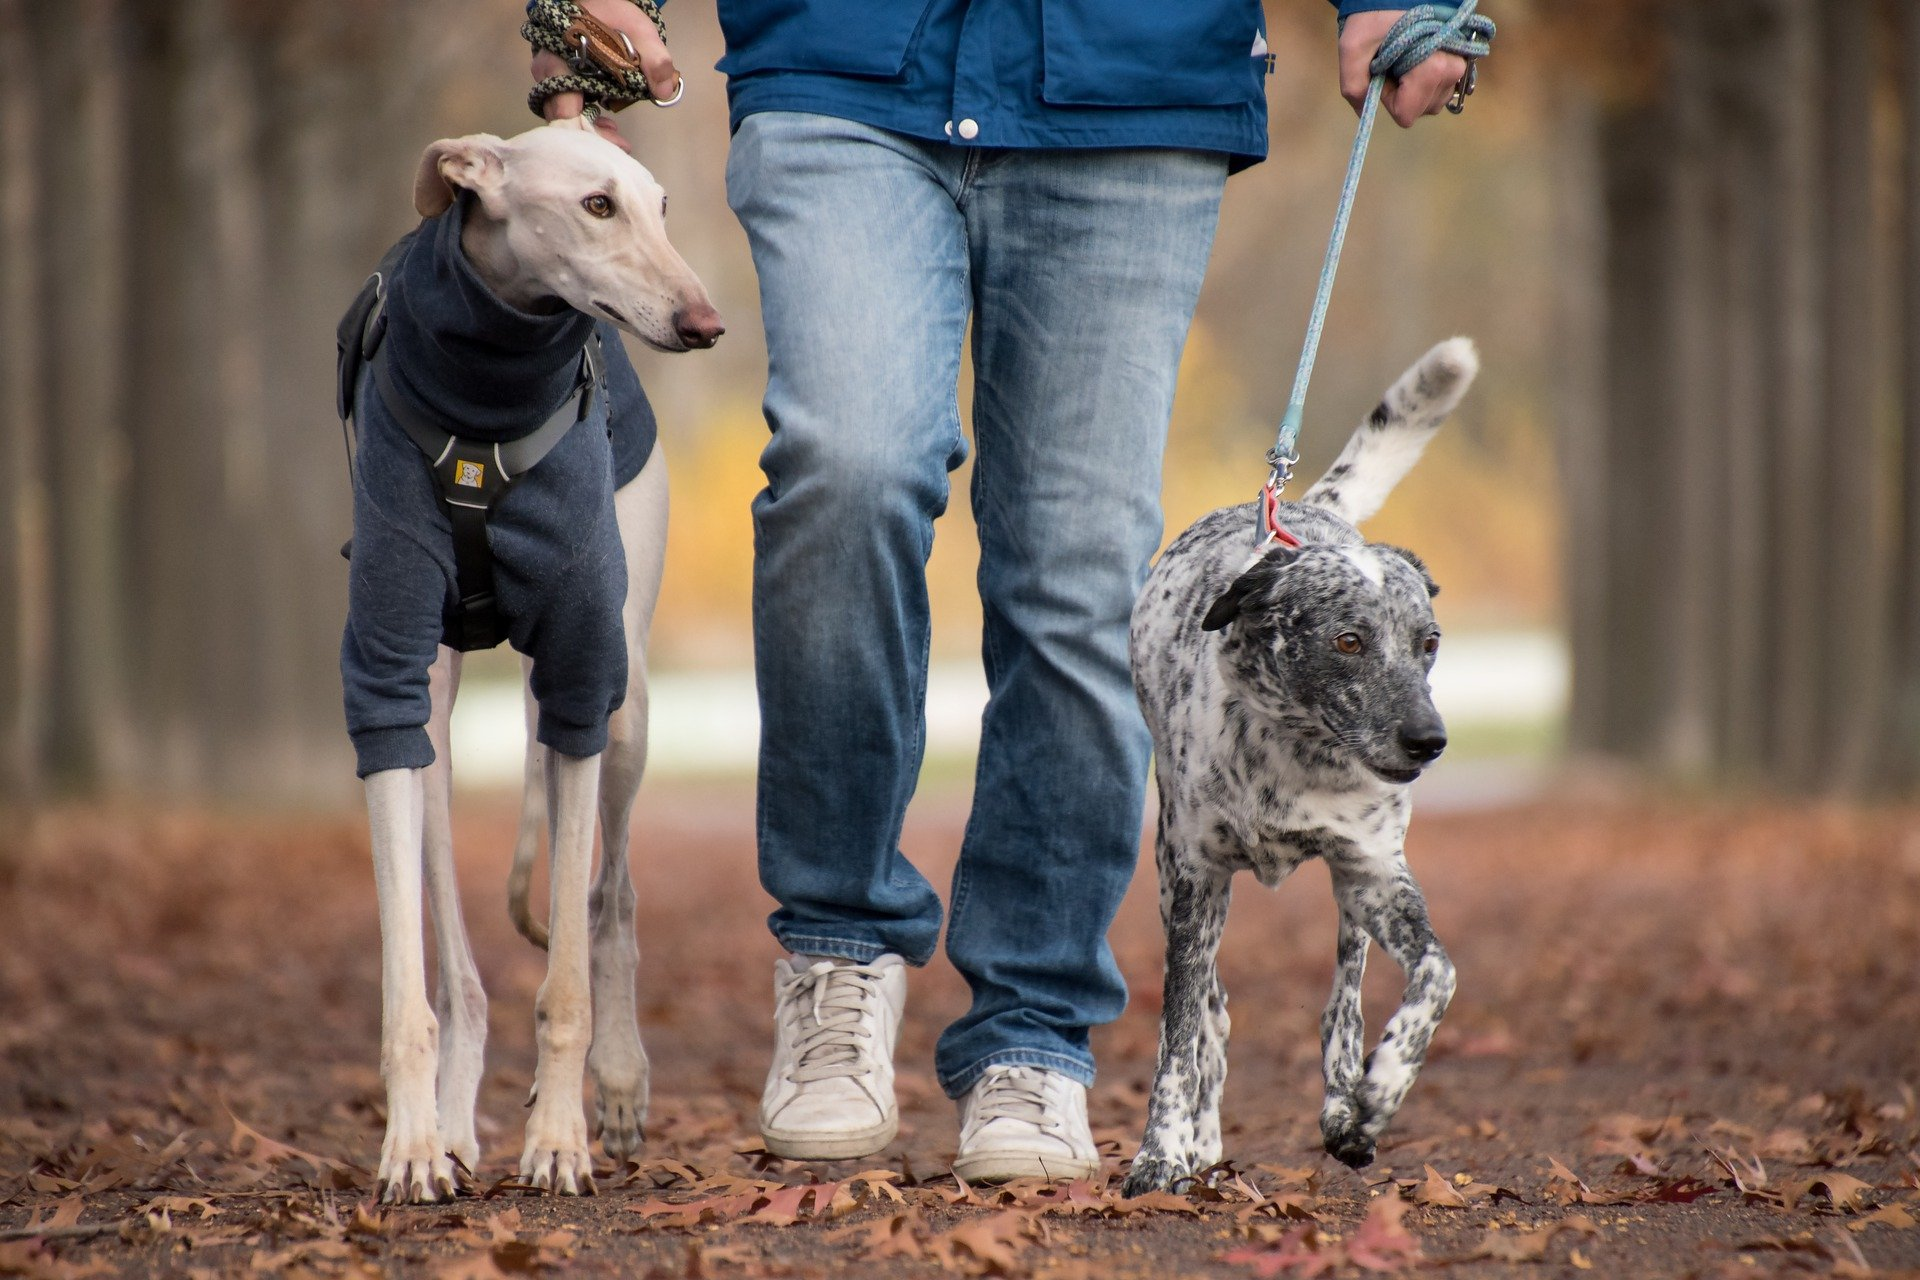 Pet Custody – PA Laws May Change